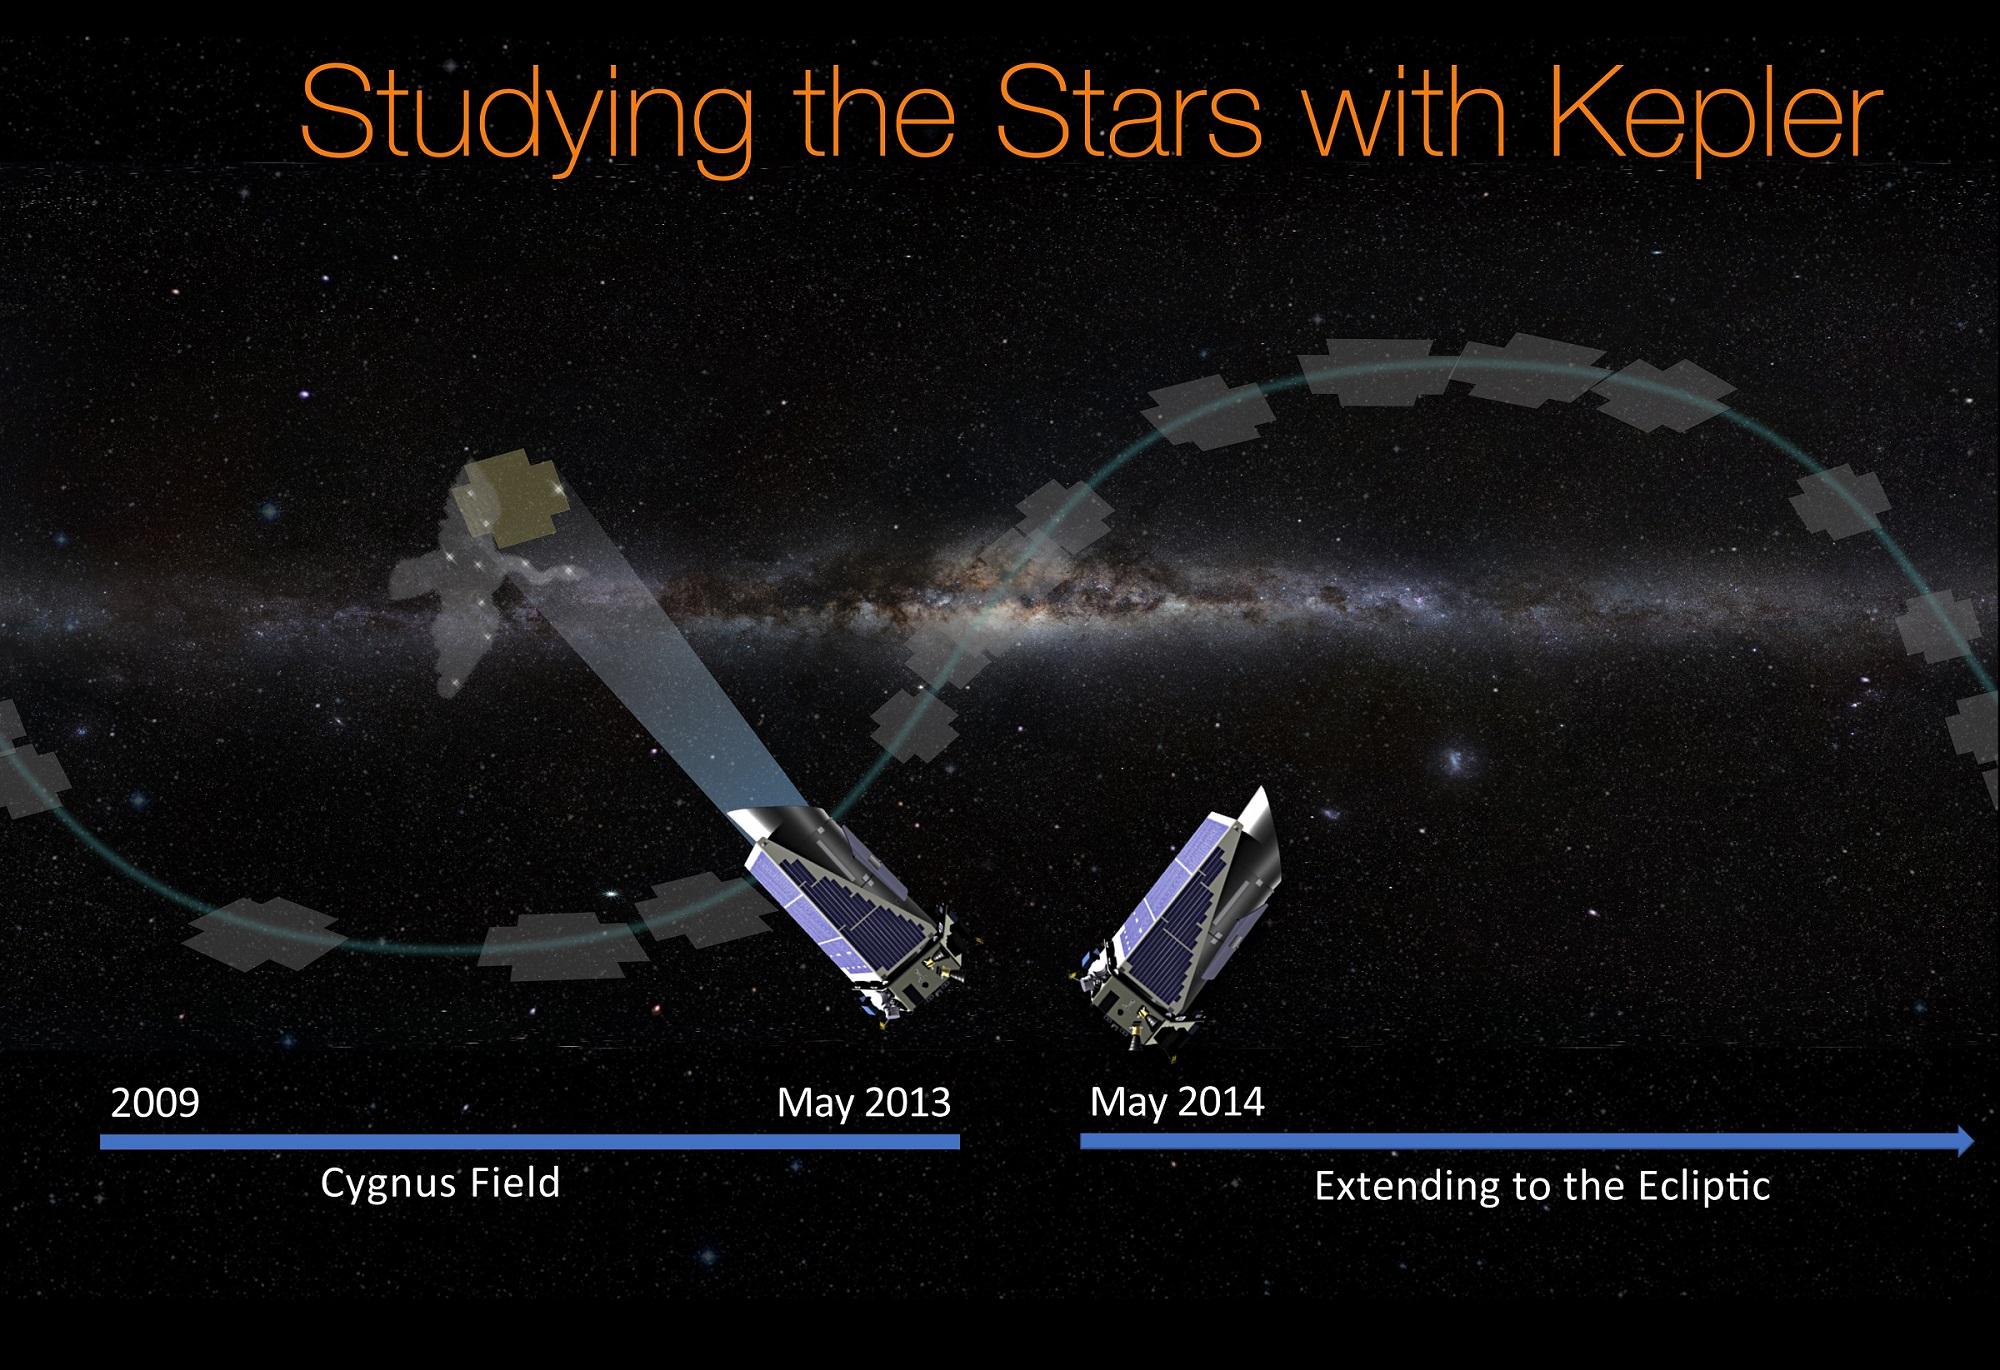 Image Credits: NASA/Wendy Stenzel